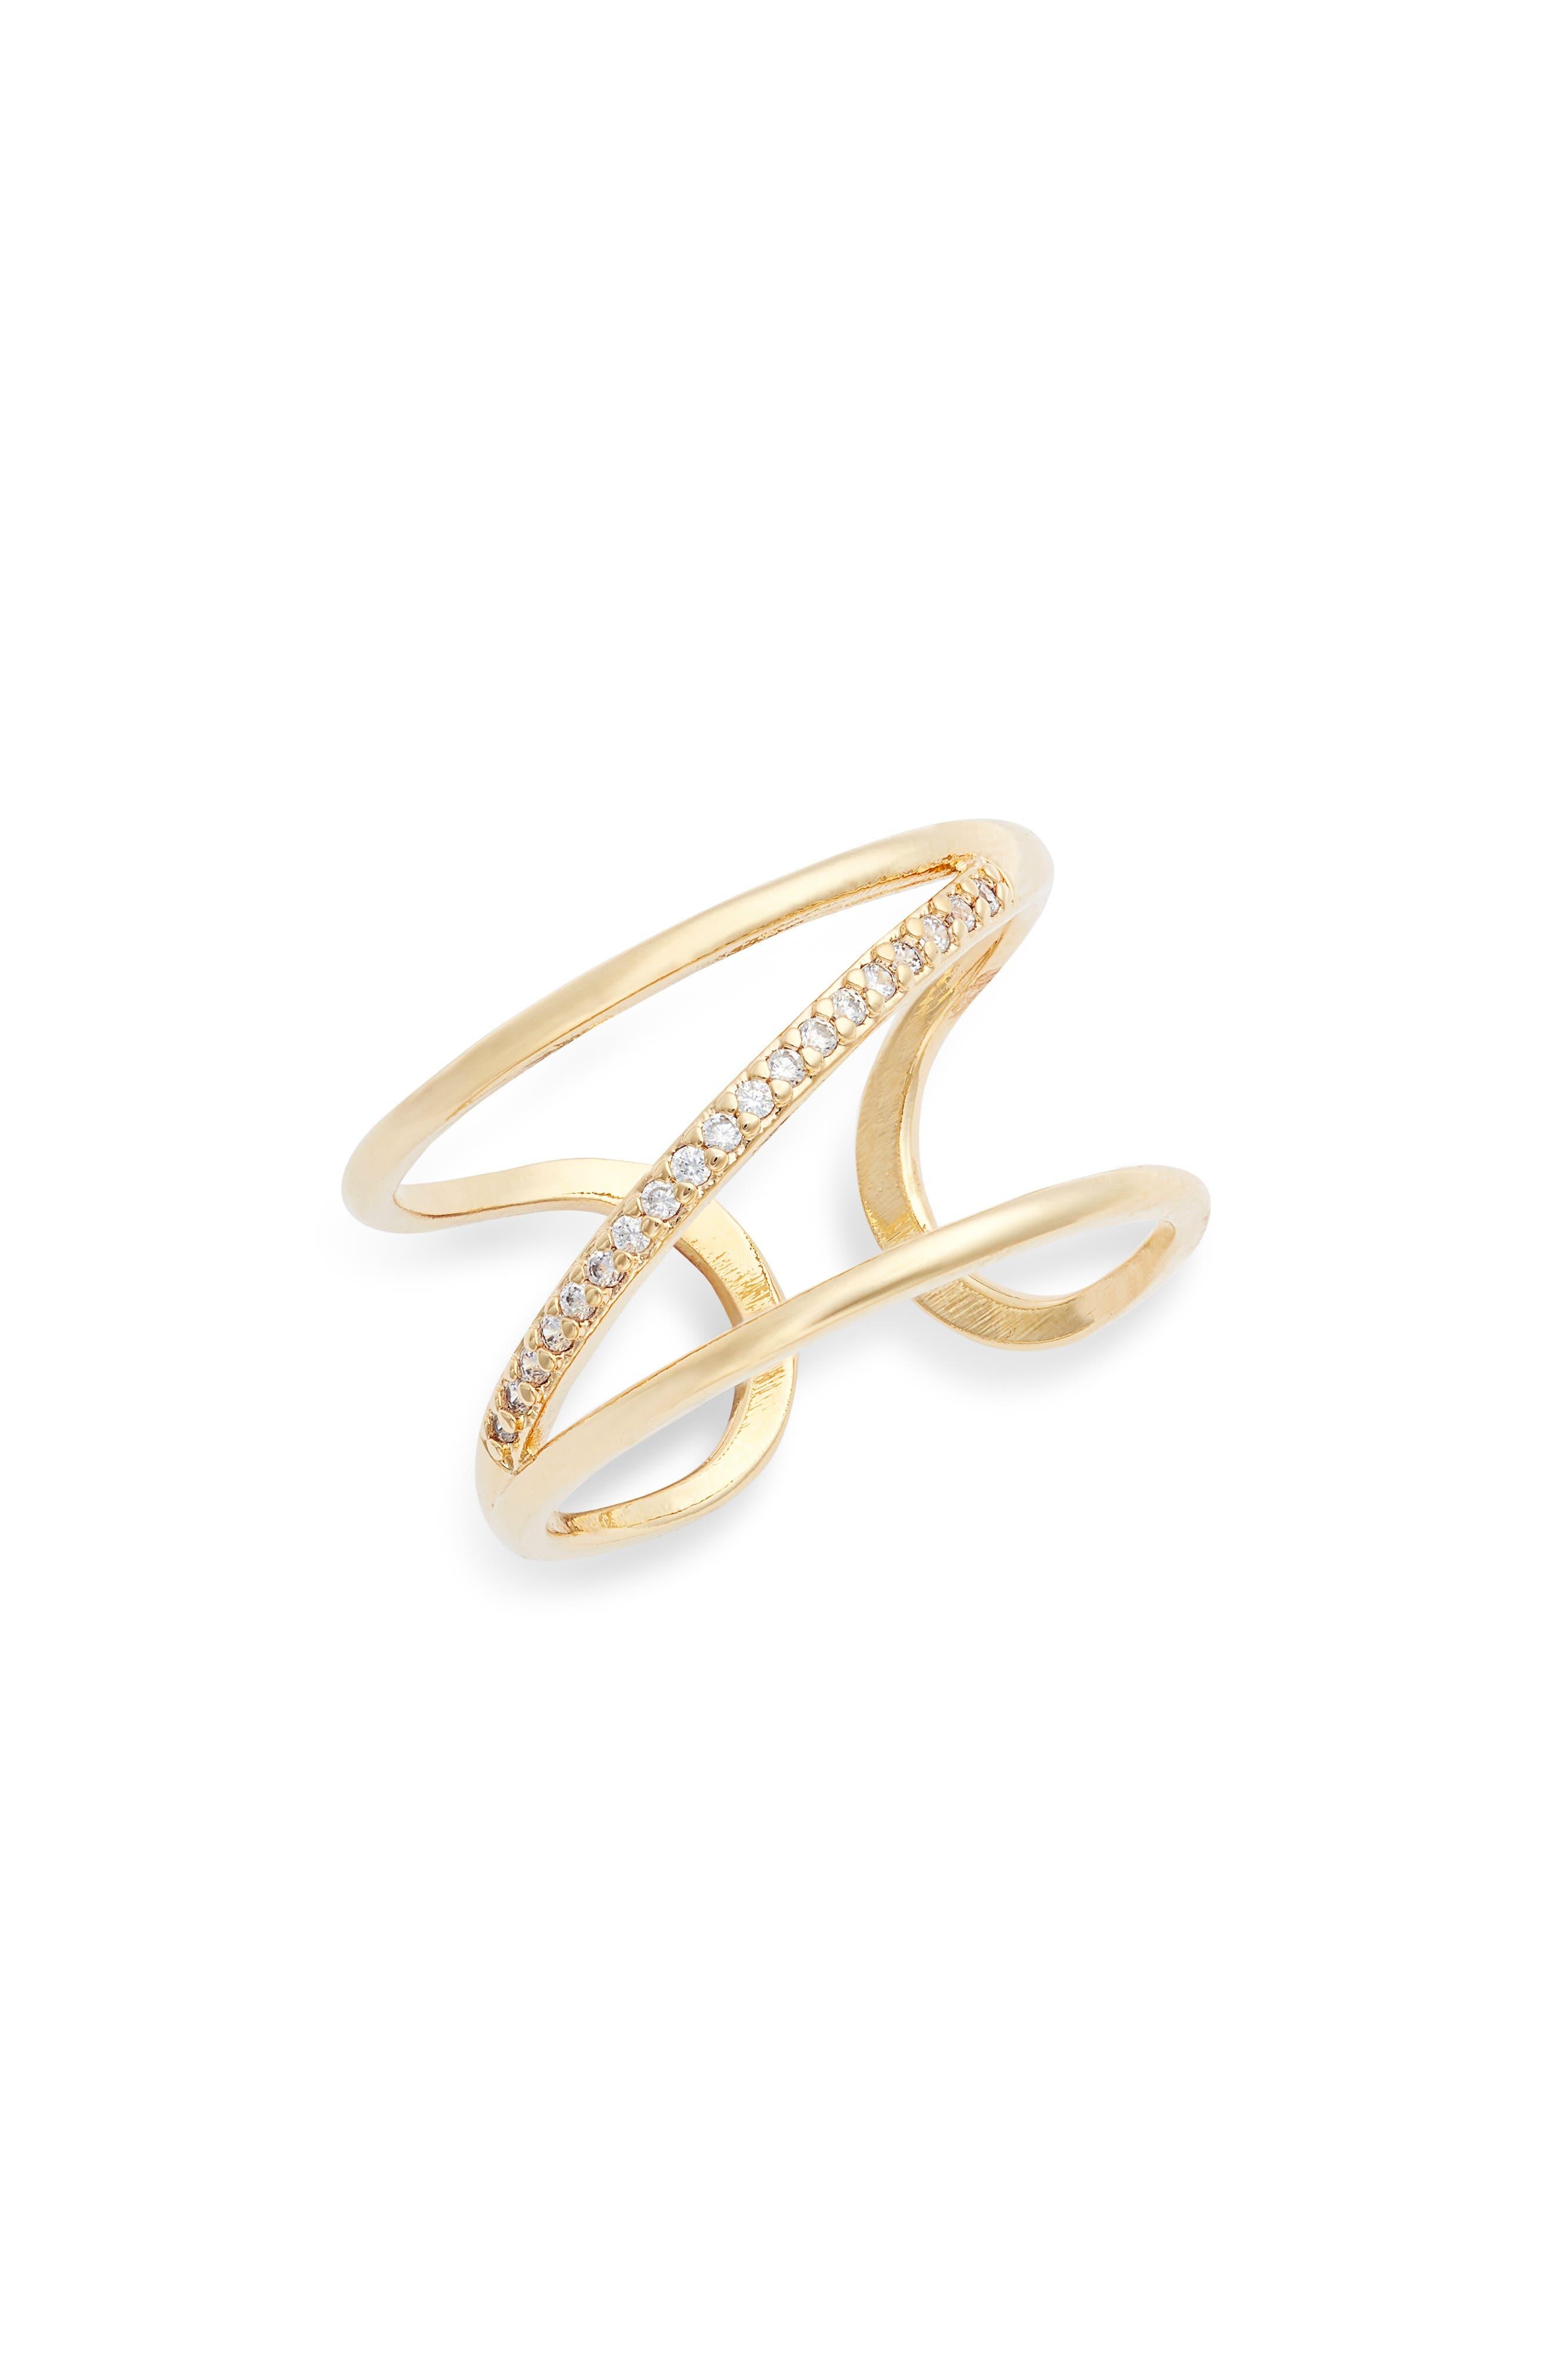 Calypso Adjustable Ring